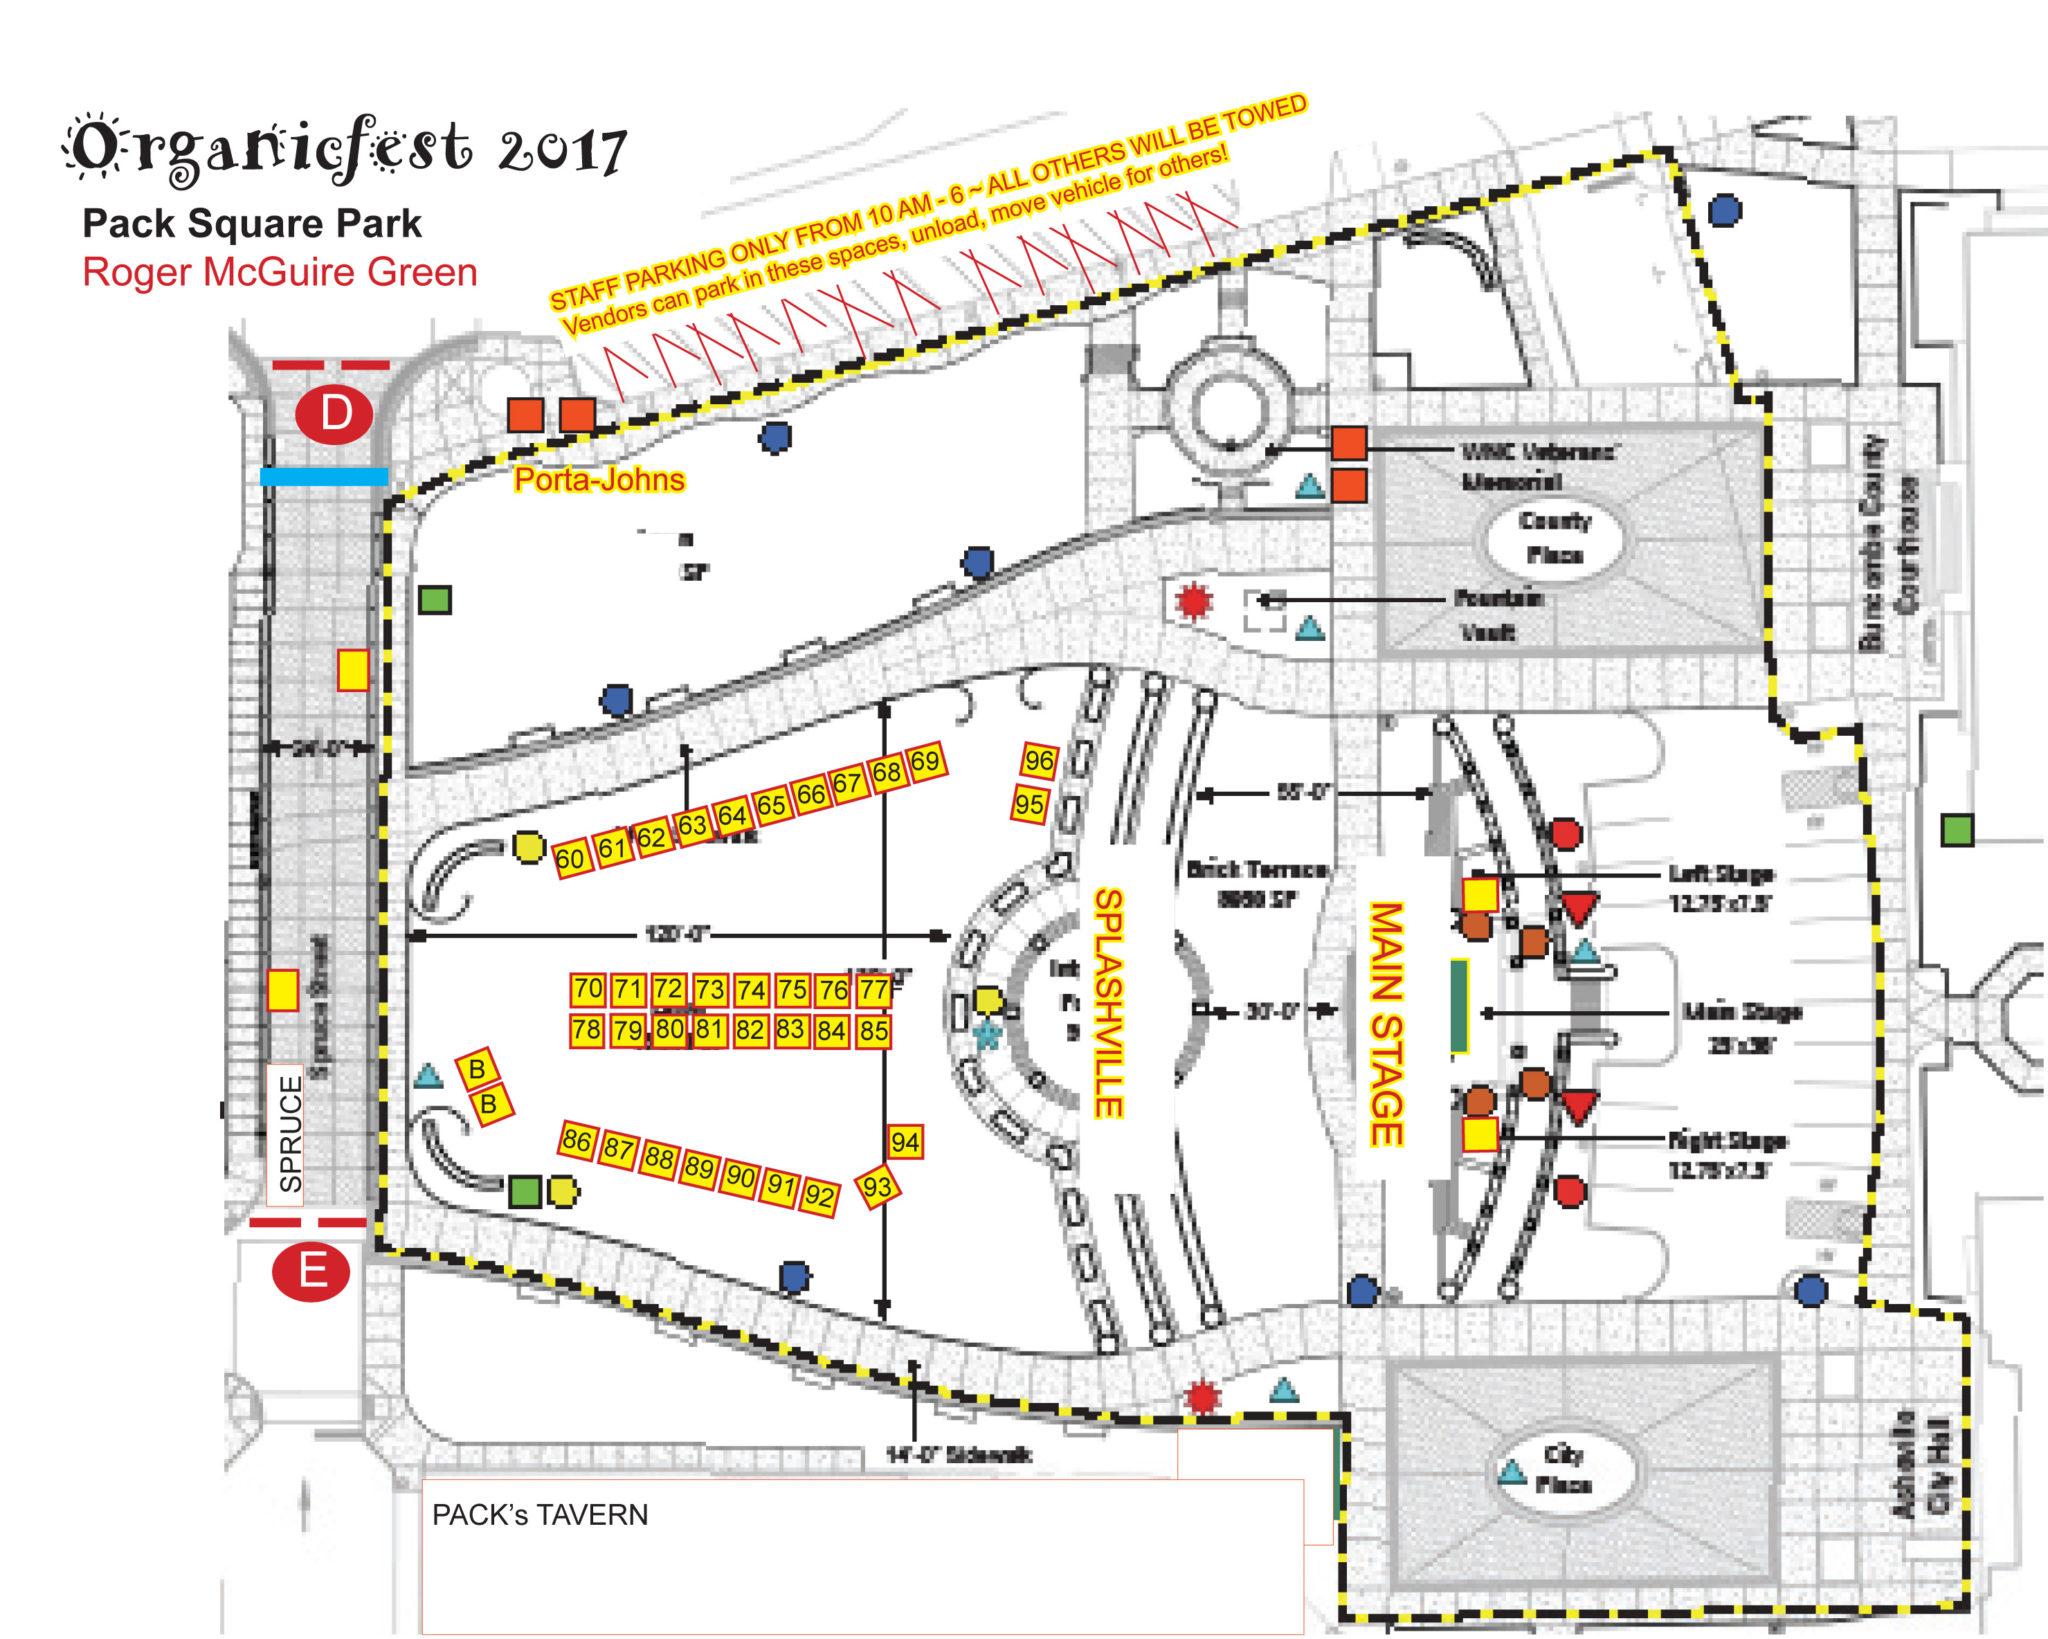 organicfest-roger-mcguire-park-c